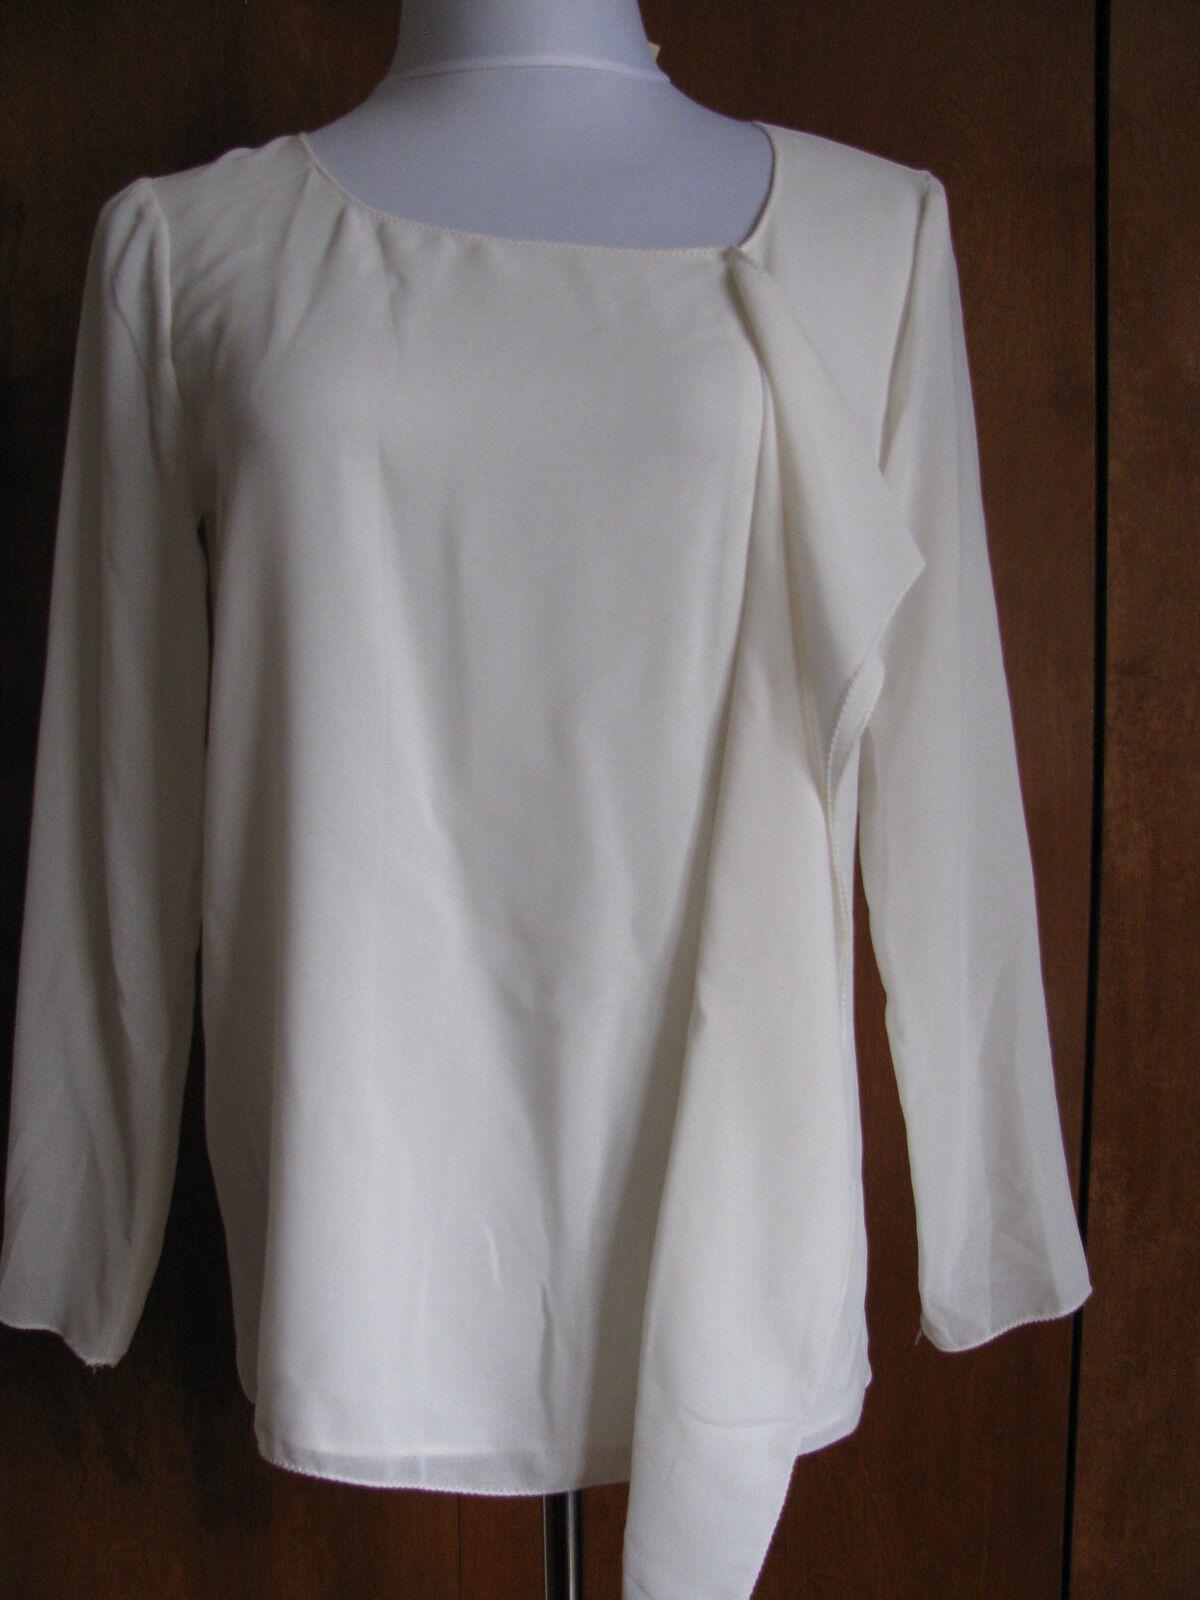 Max Studio damen ivory ruffle blouse top Größe  Petite Large NWT